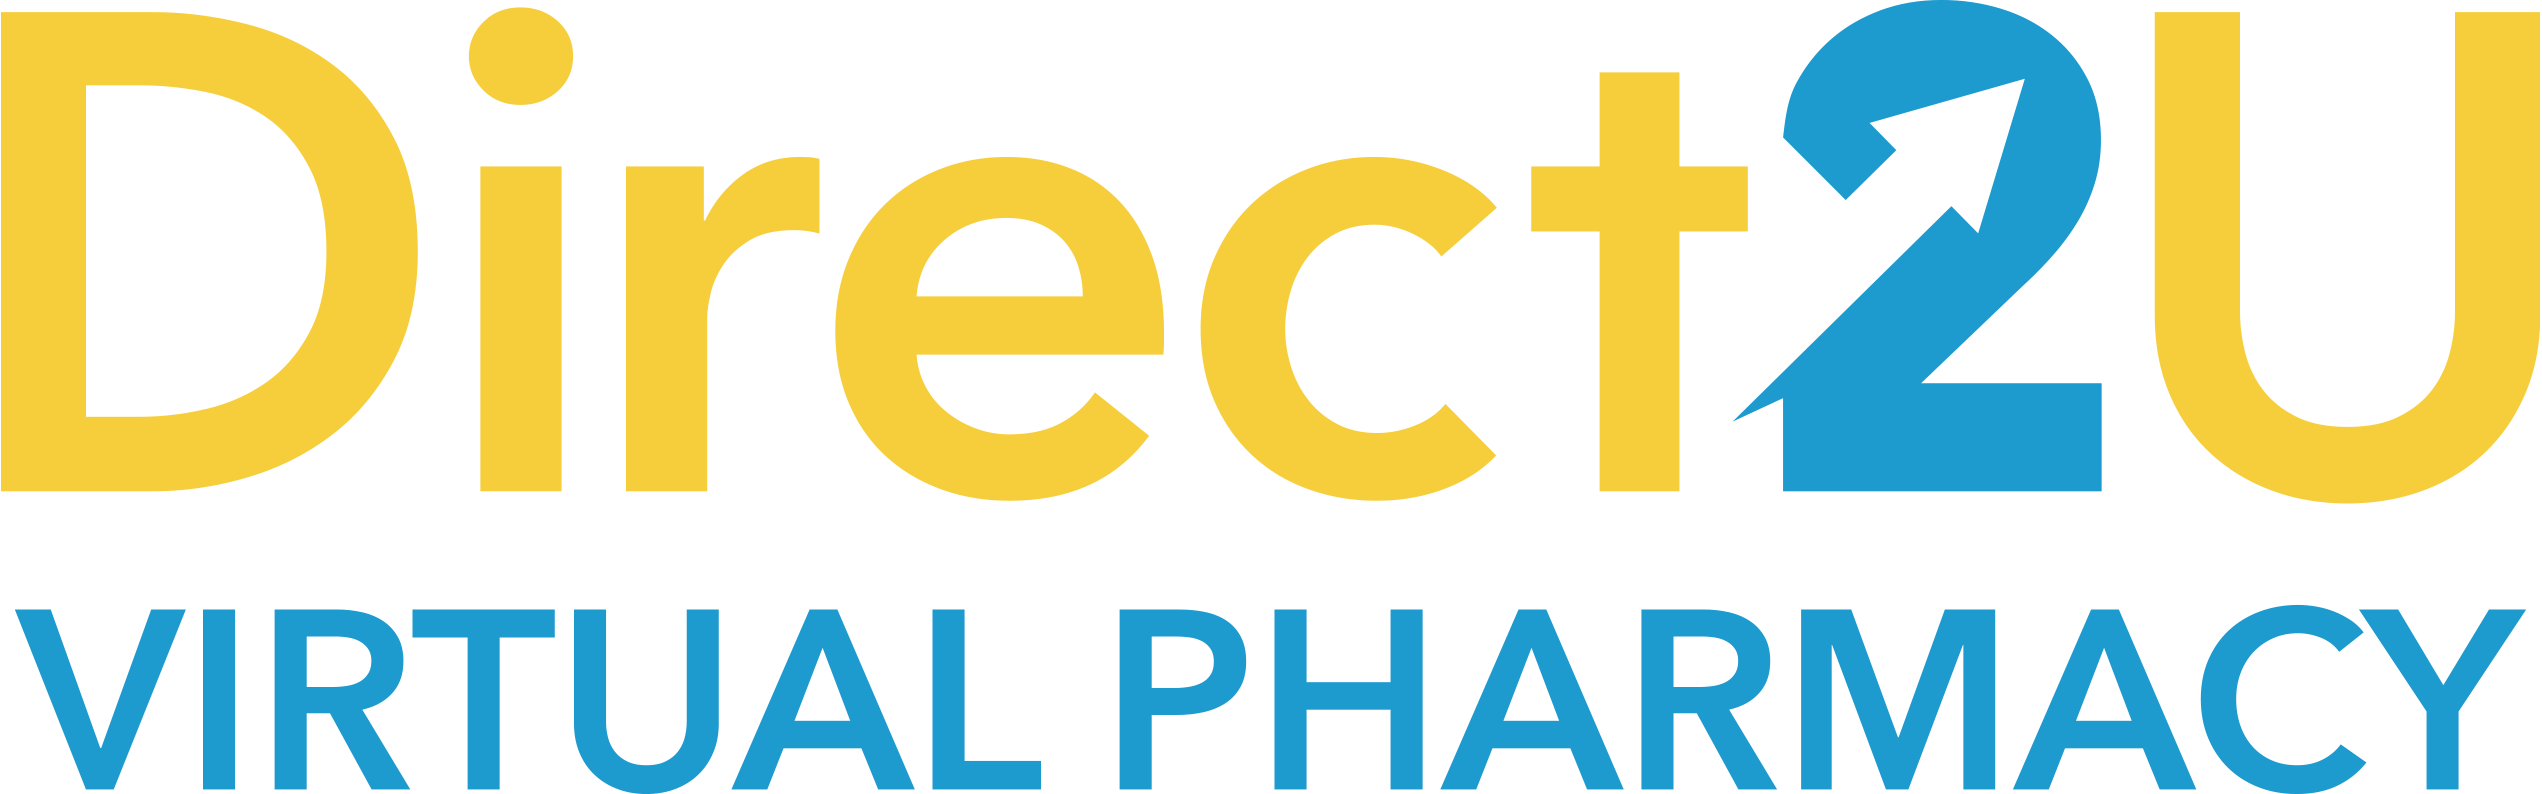 Direct2U Virtual Pharmacy